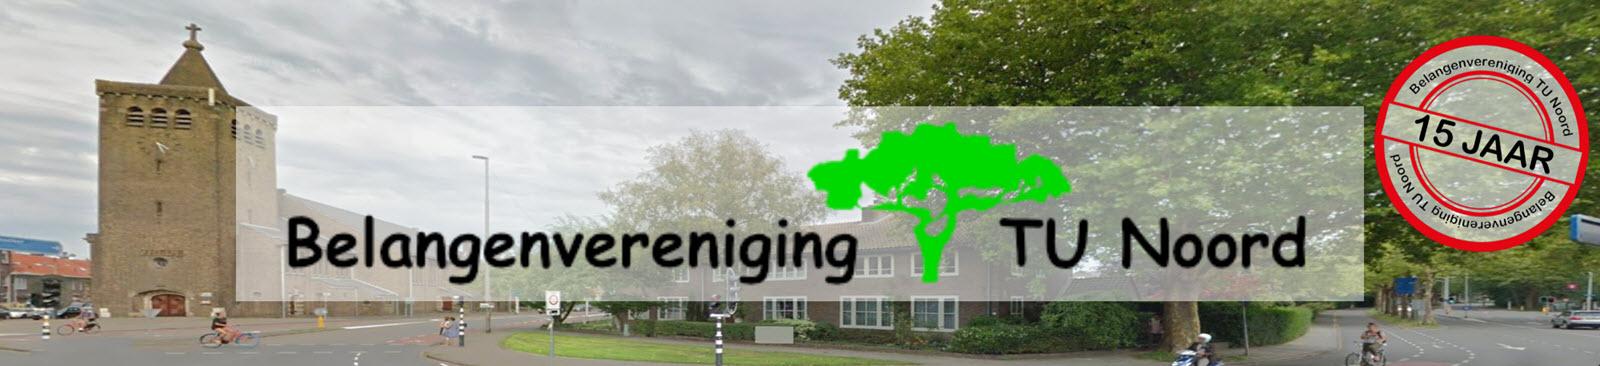 Belangenvereniging TU Noord